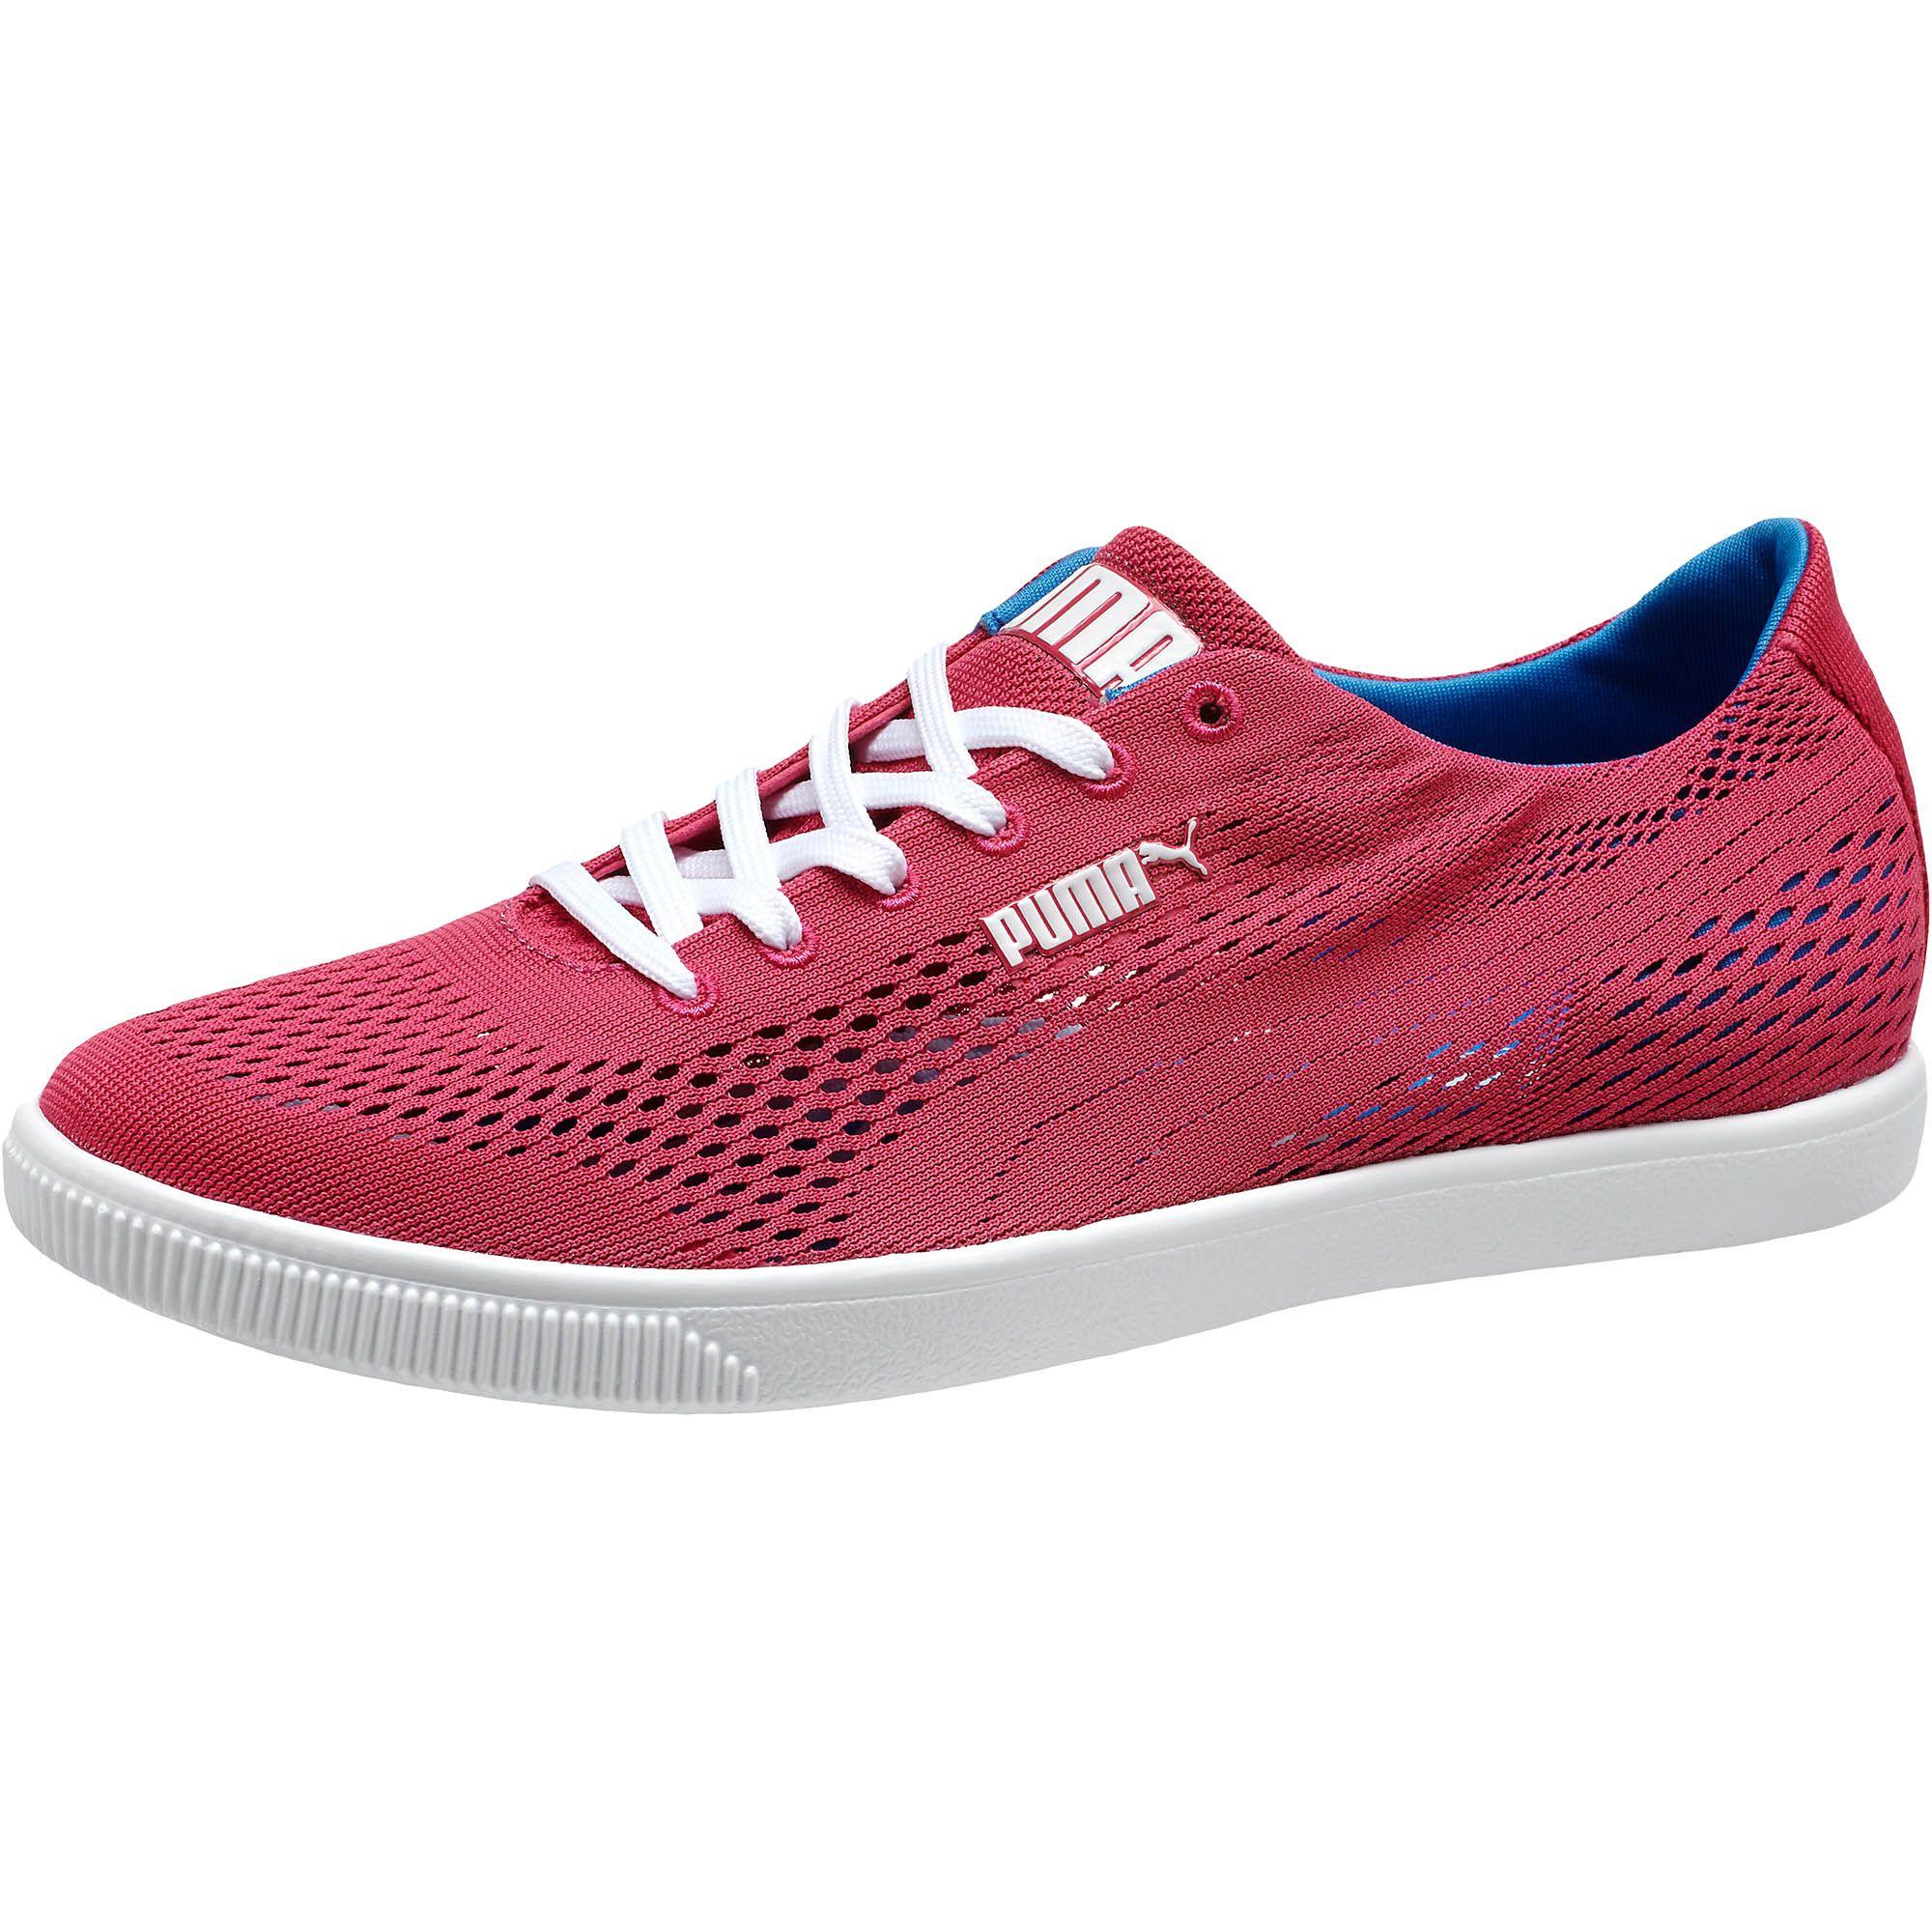 Glyde Lite Engineered Mesh Women's Sneakers